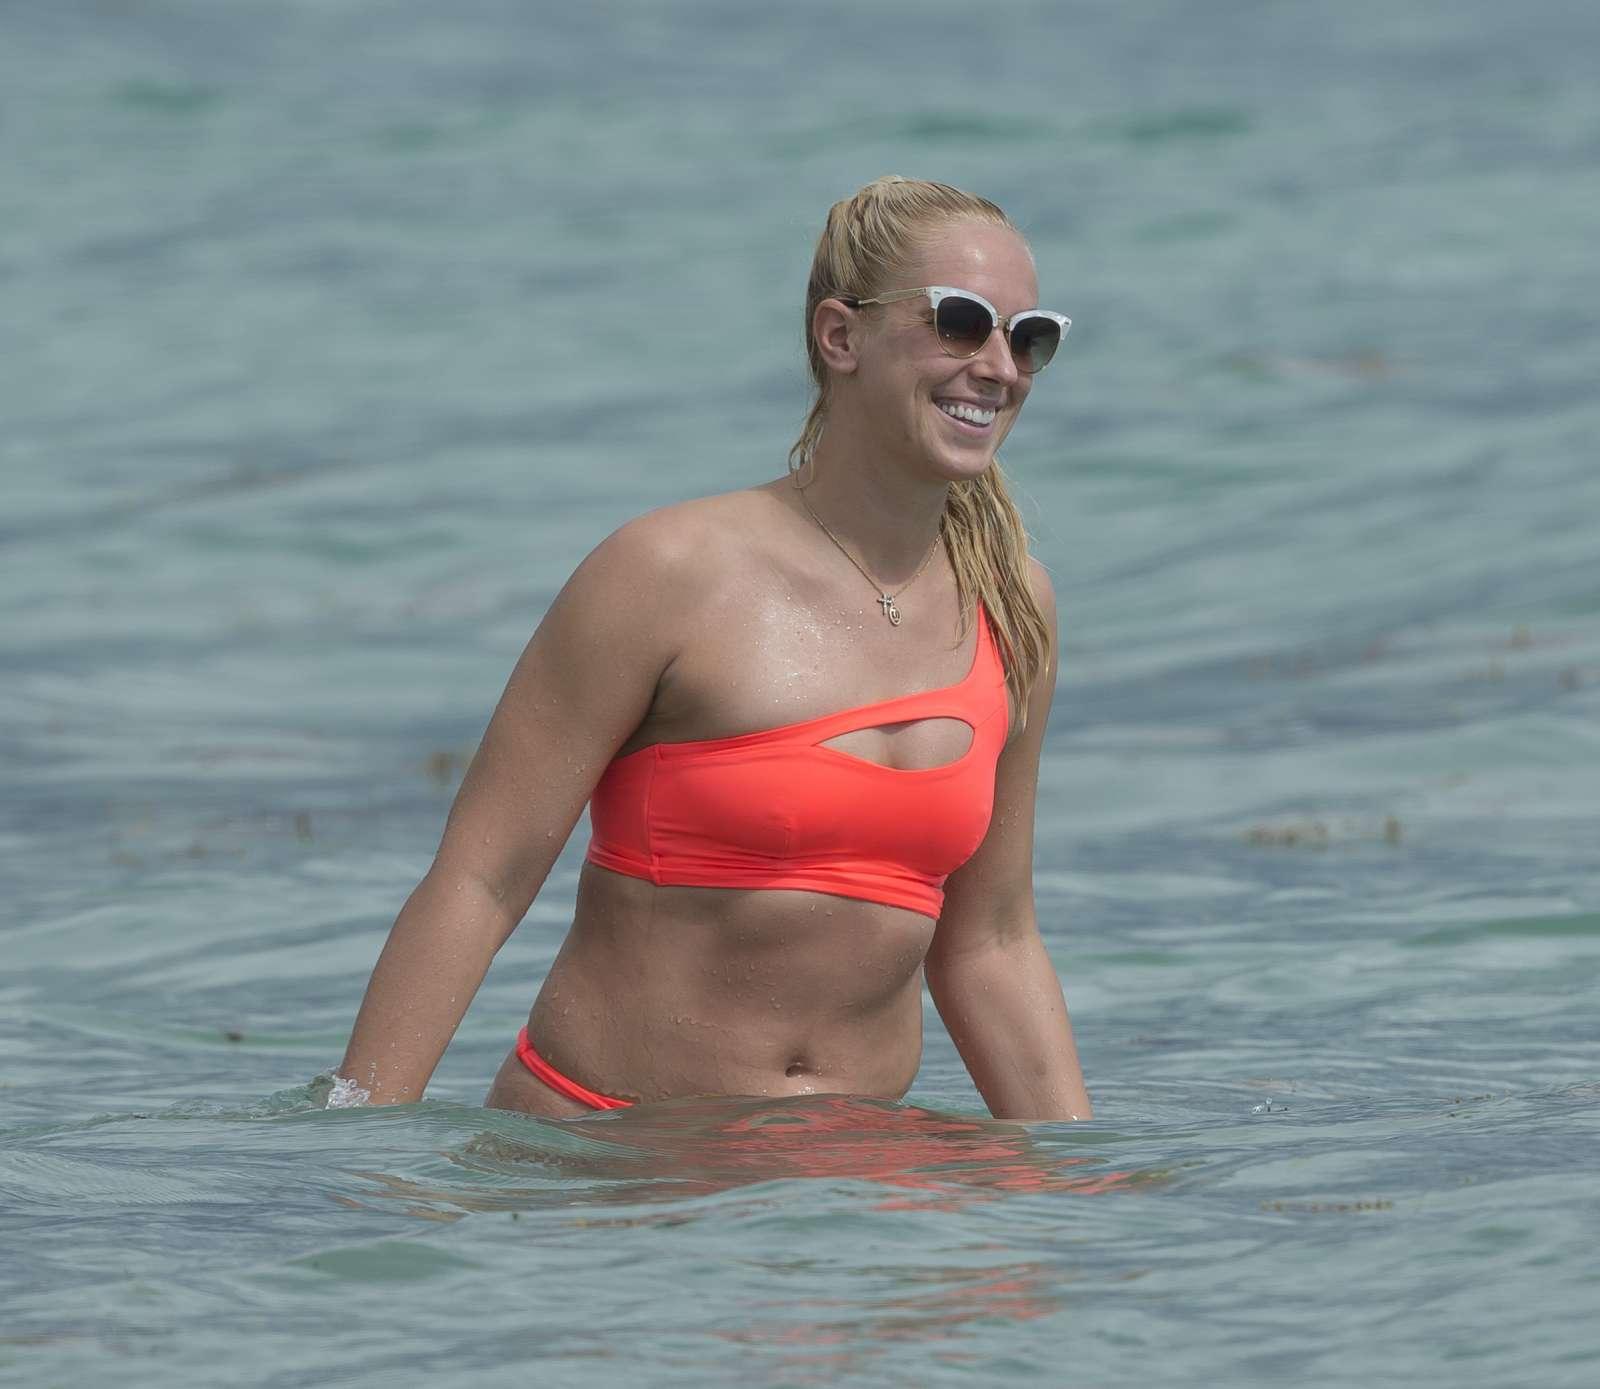 Bikini Sabine Lisicki nudes (95 photo), Tits, Paparazzi, Twitter, butt 2006